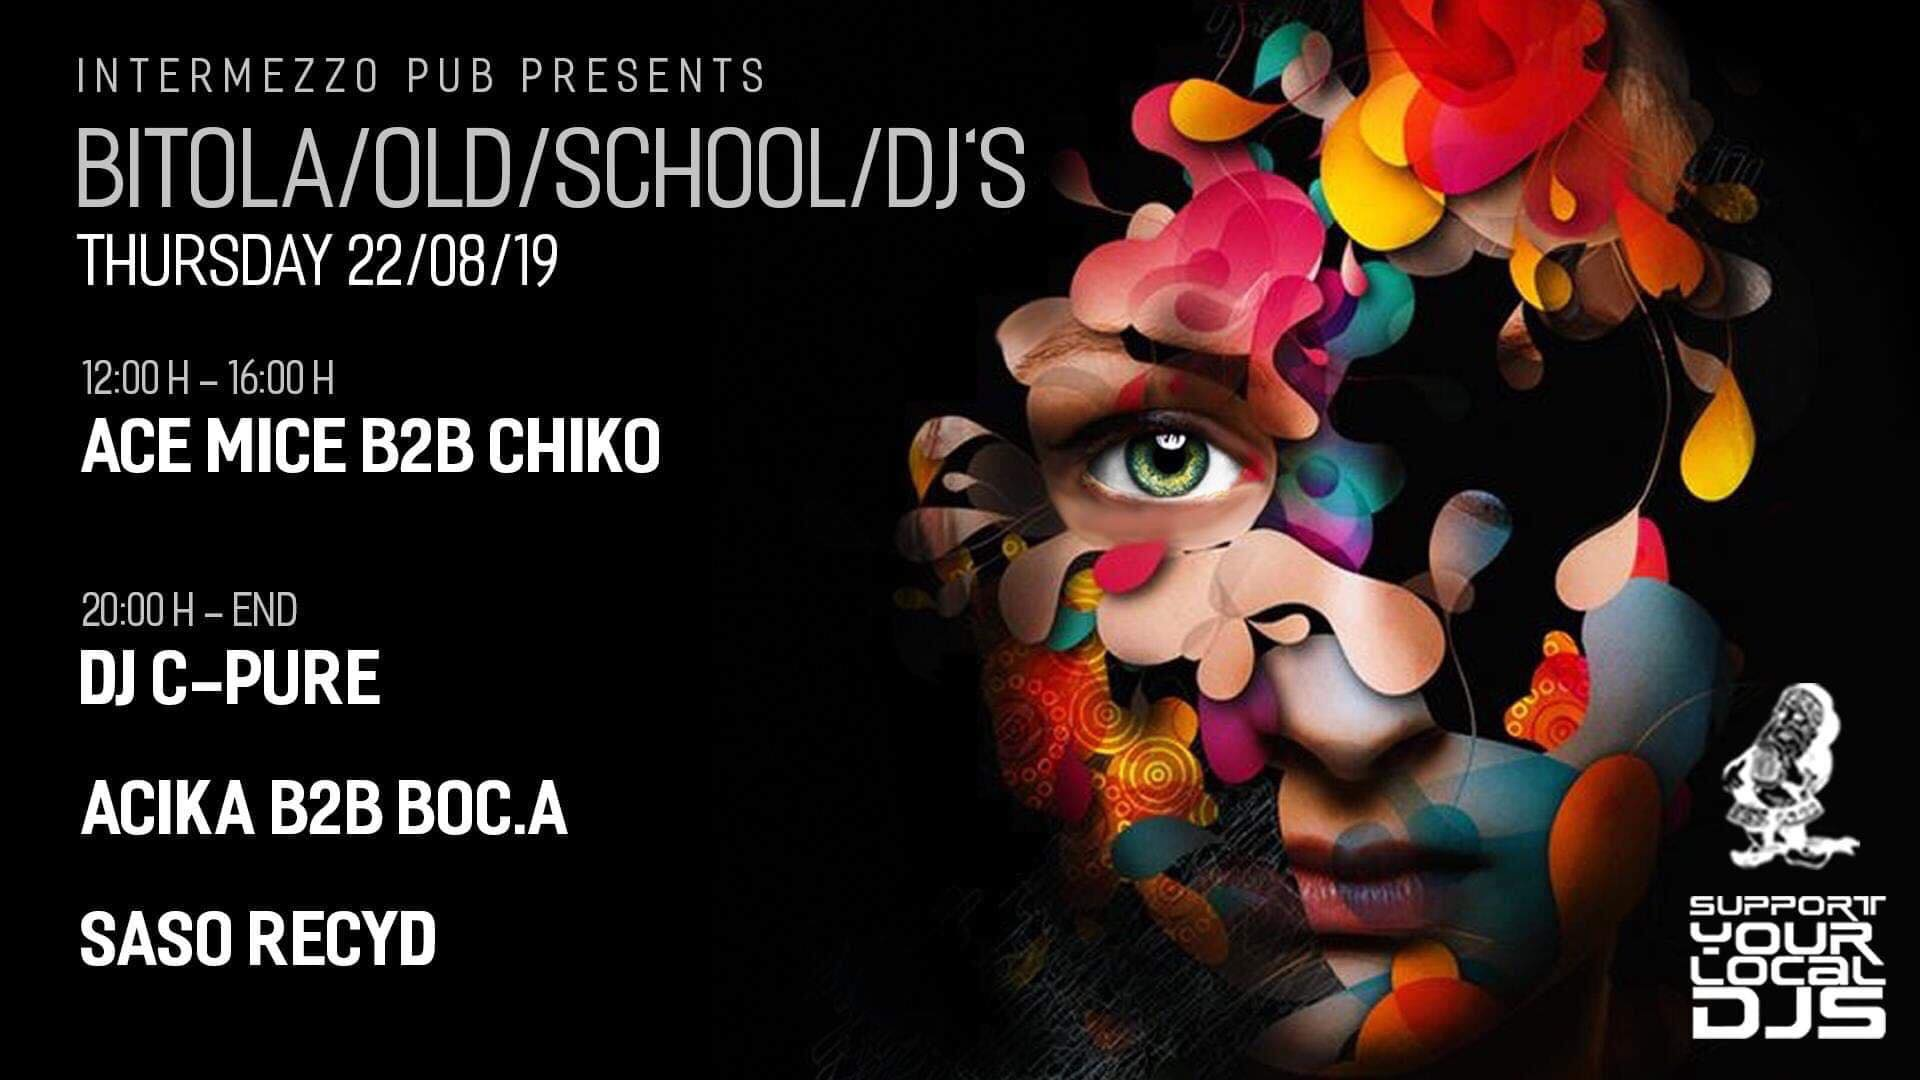 Bitola/ Old/ School/ DJ's градска забава за сите генерации!